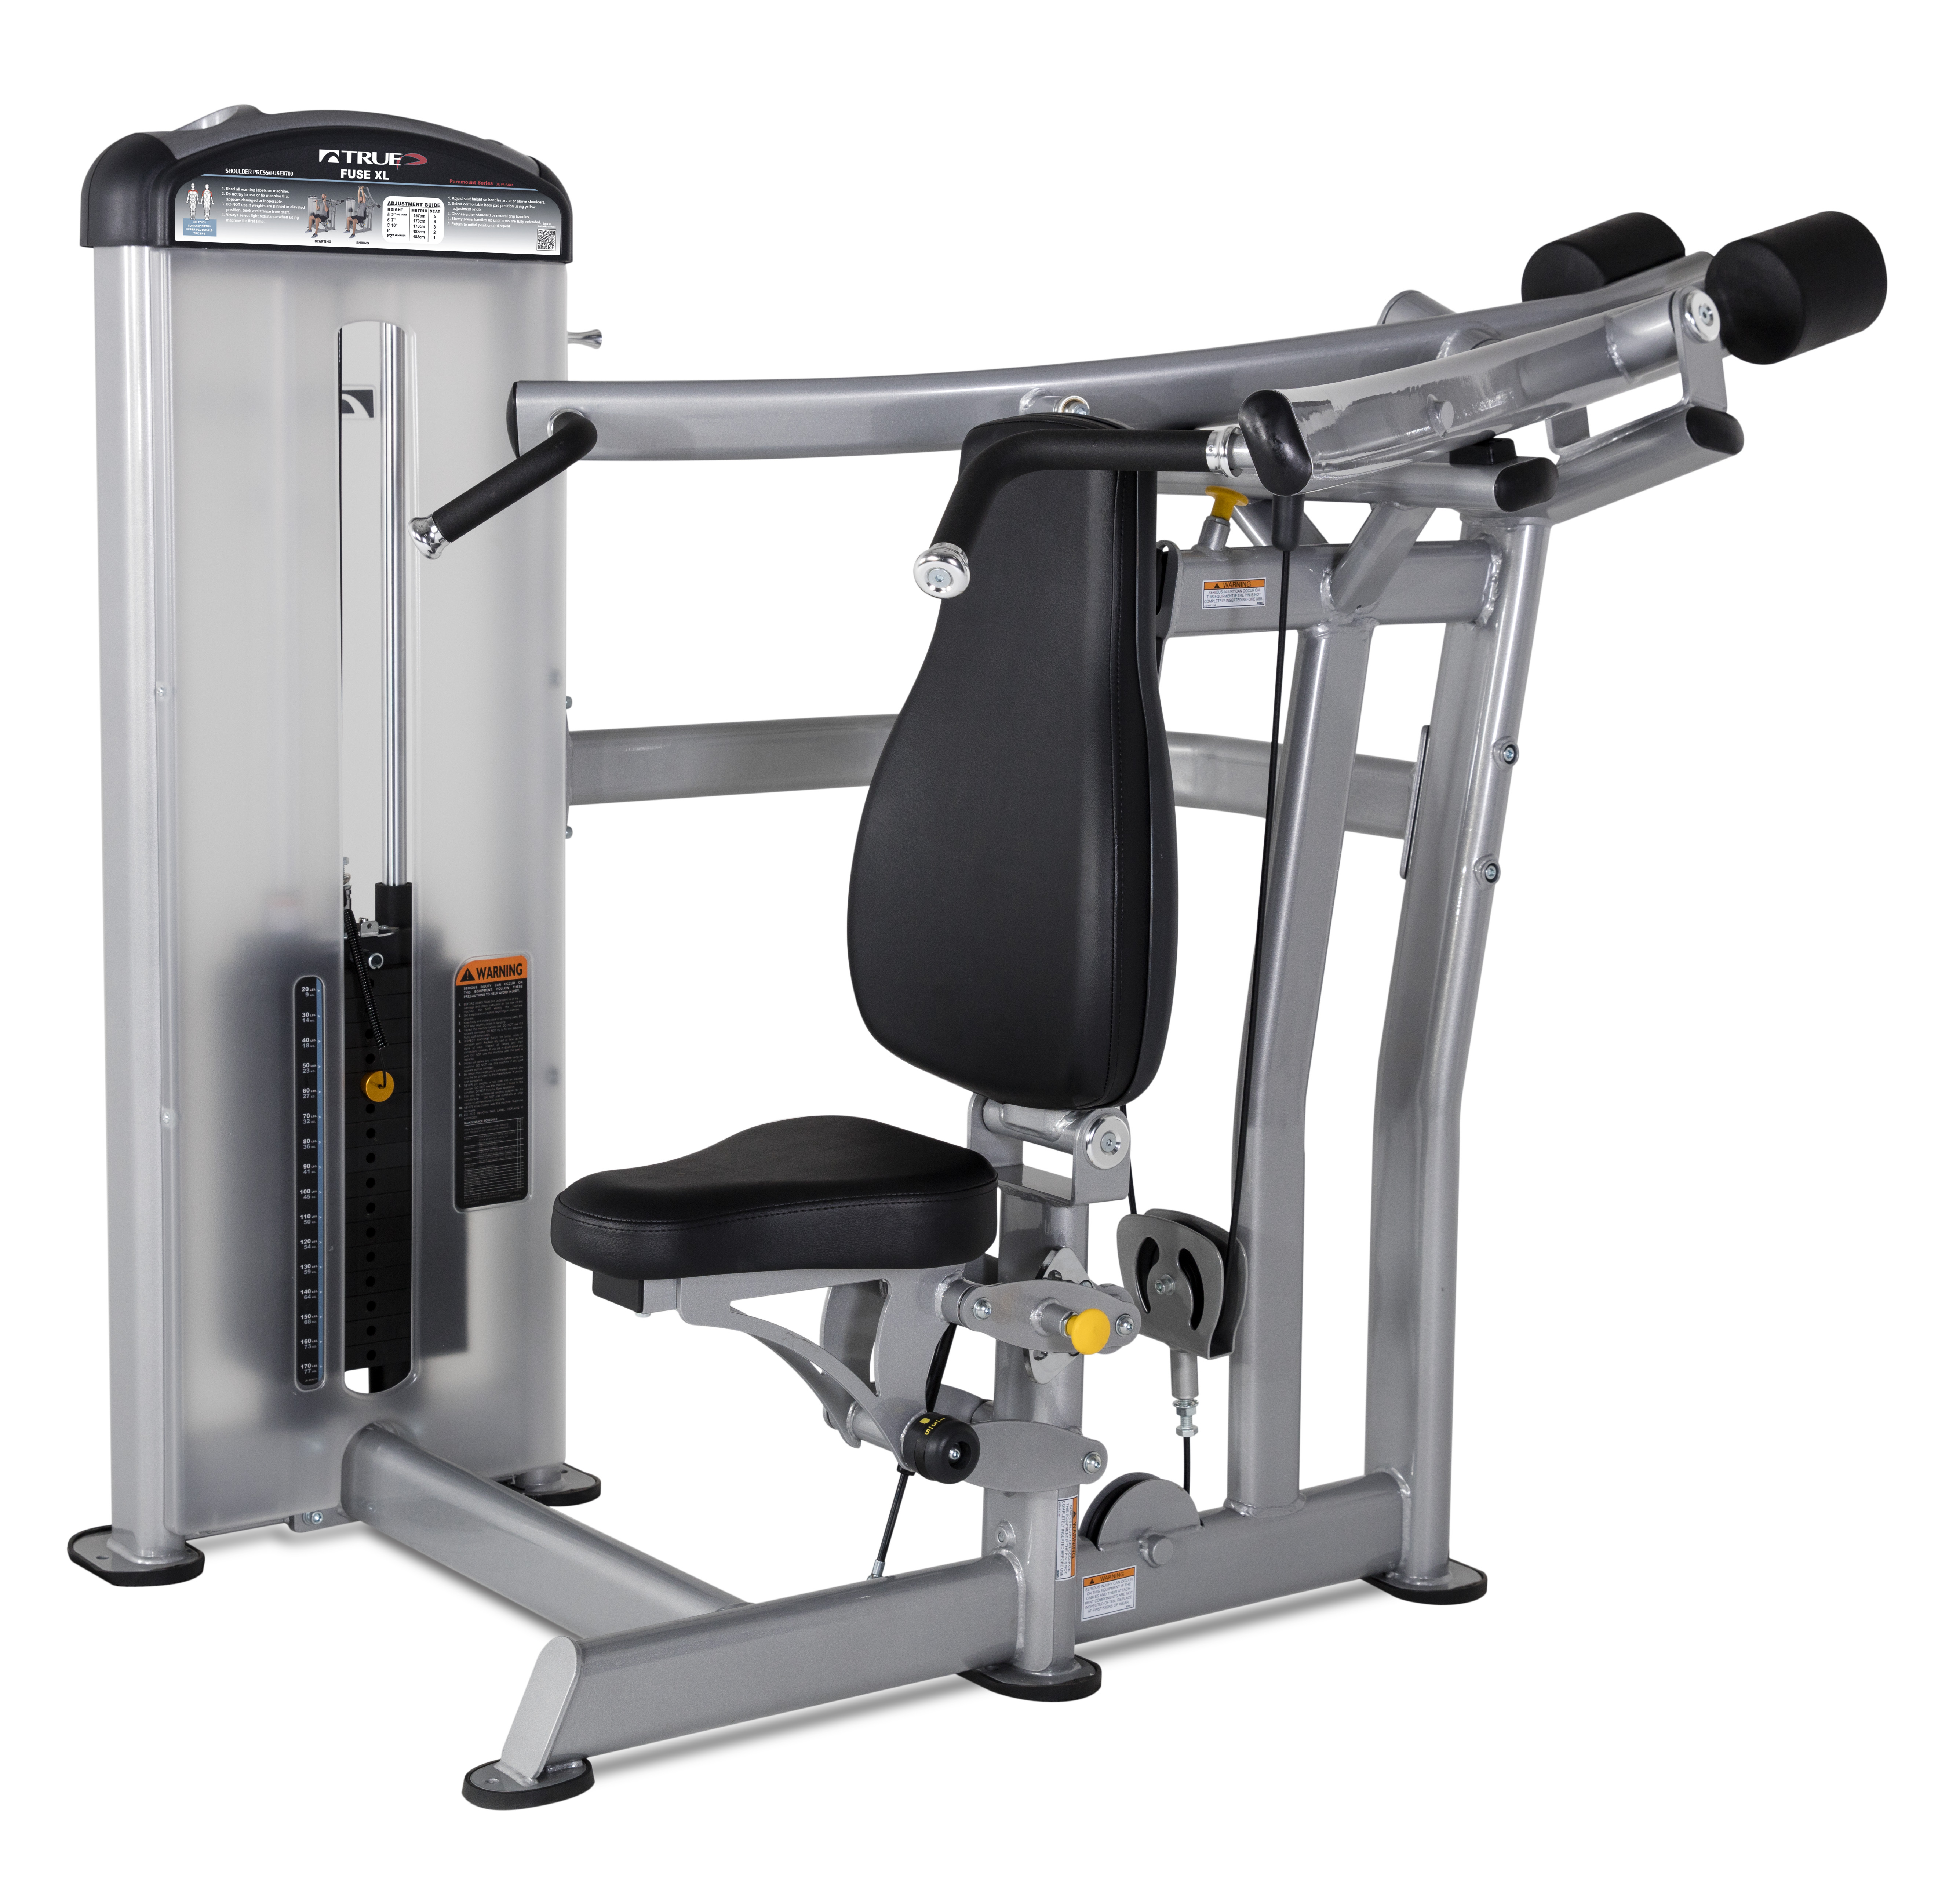 Fitness Equipment Services: Paramount FUSE XL 0700 Shoulder Press